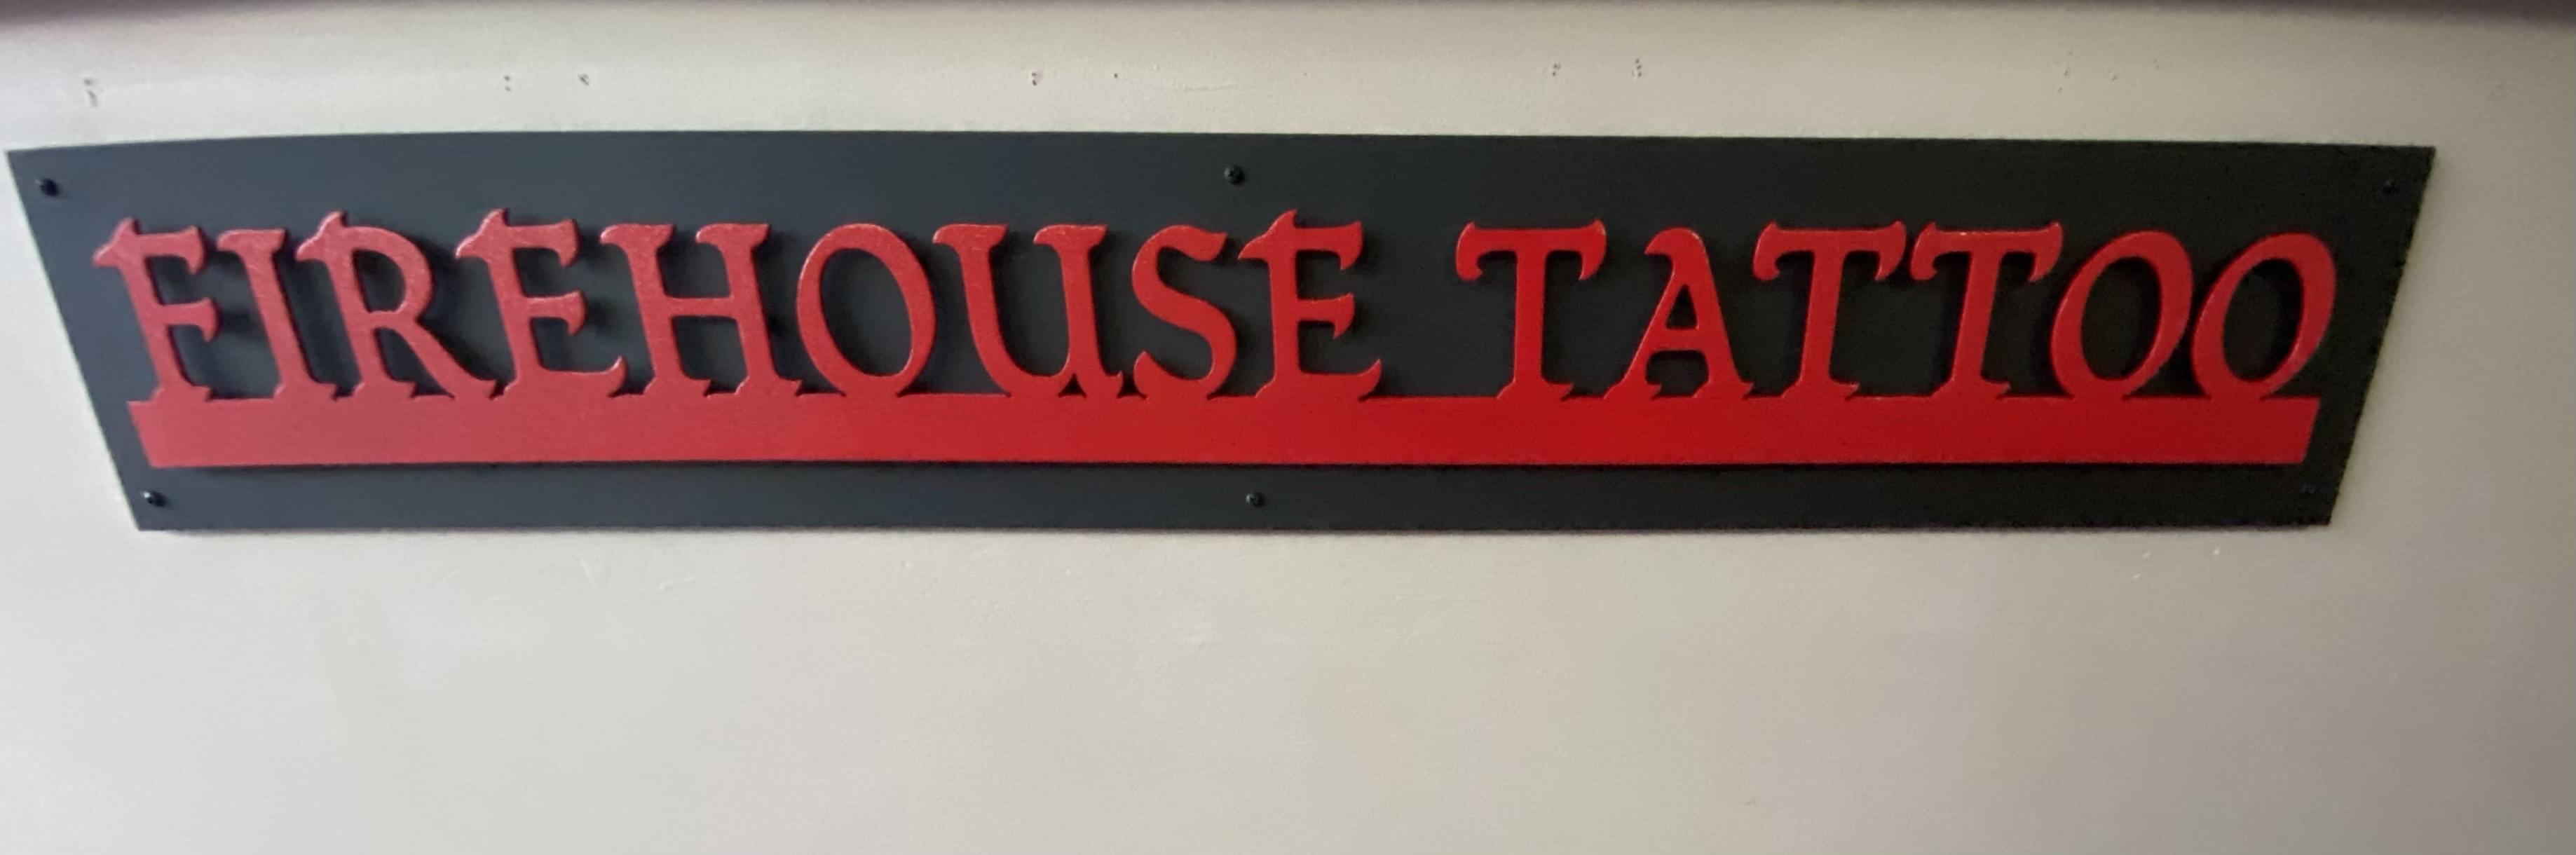 Firehouse Tat